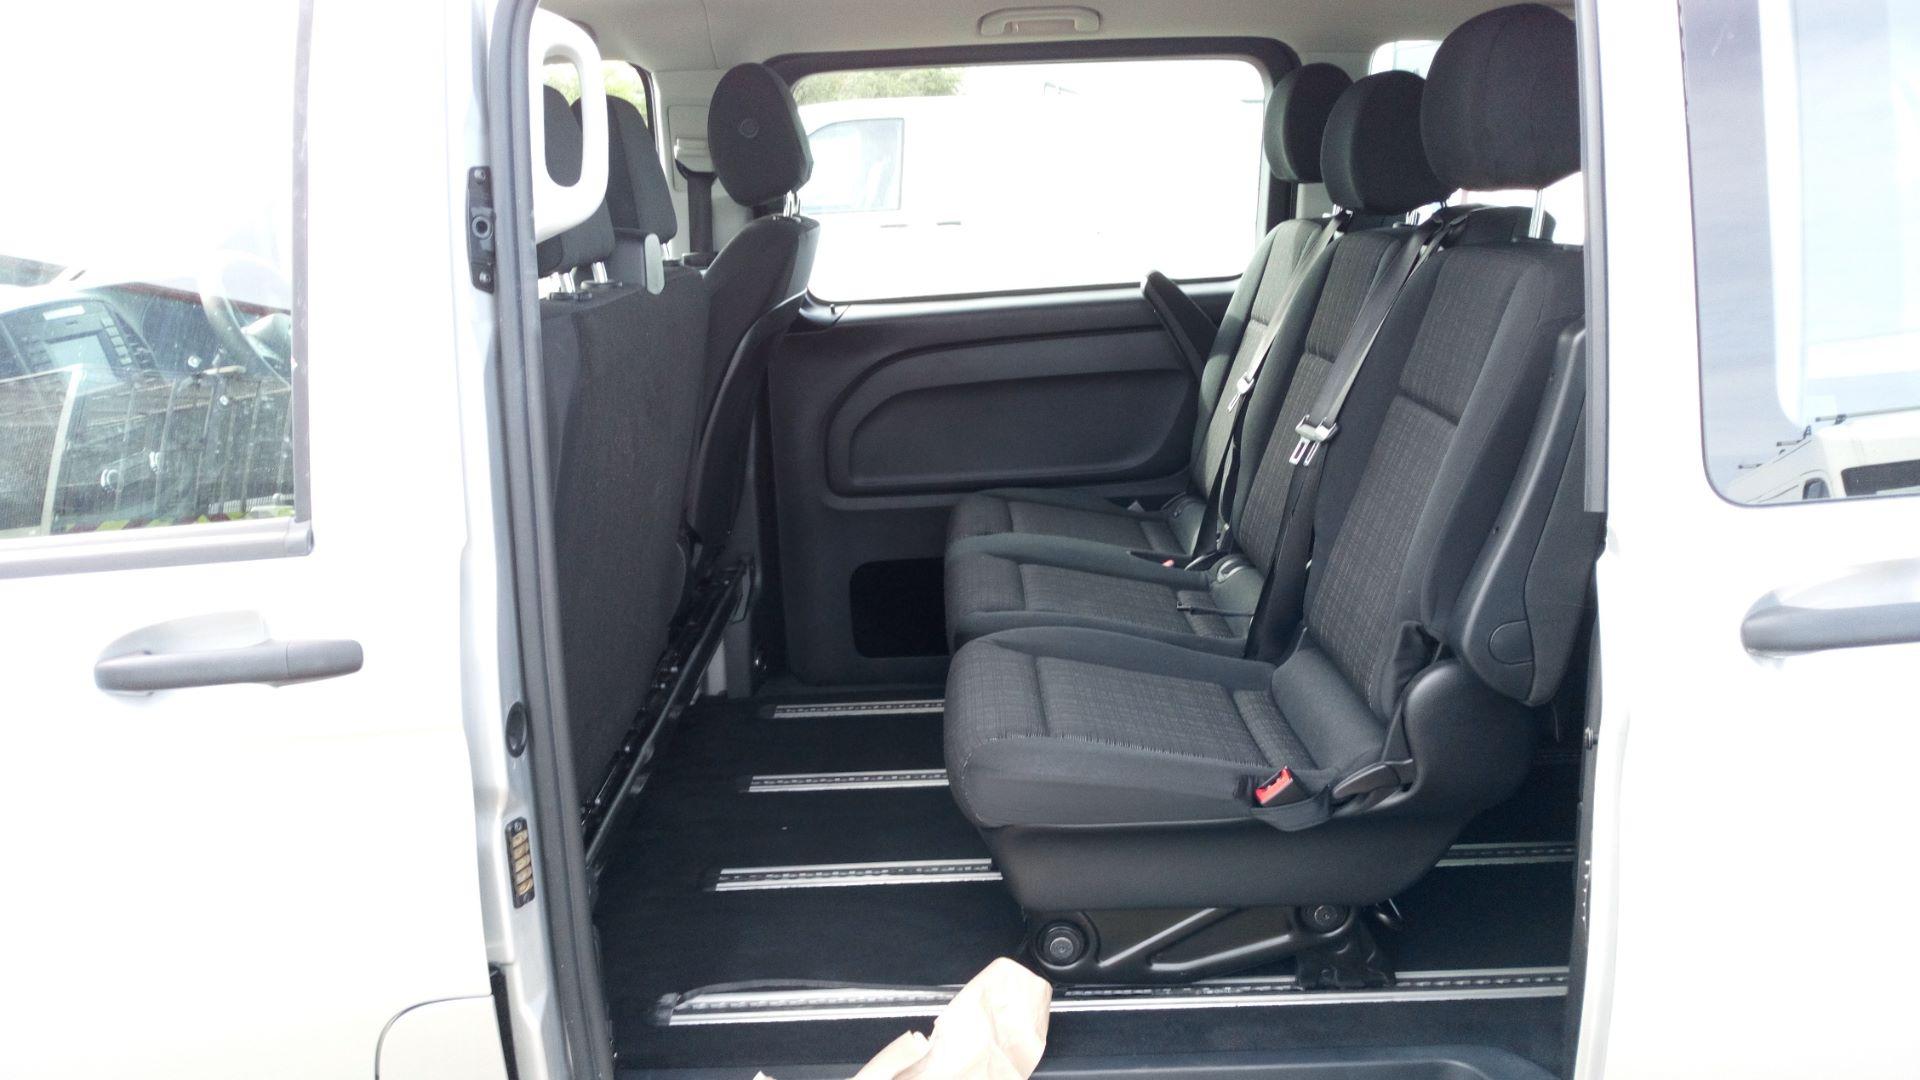 2019 Mercedes-Benz Vito 119 Cdi Select 8-Seater 7G-Tronic (KR19UZO) Image 9